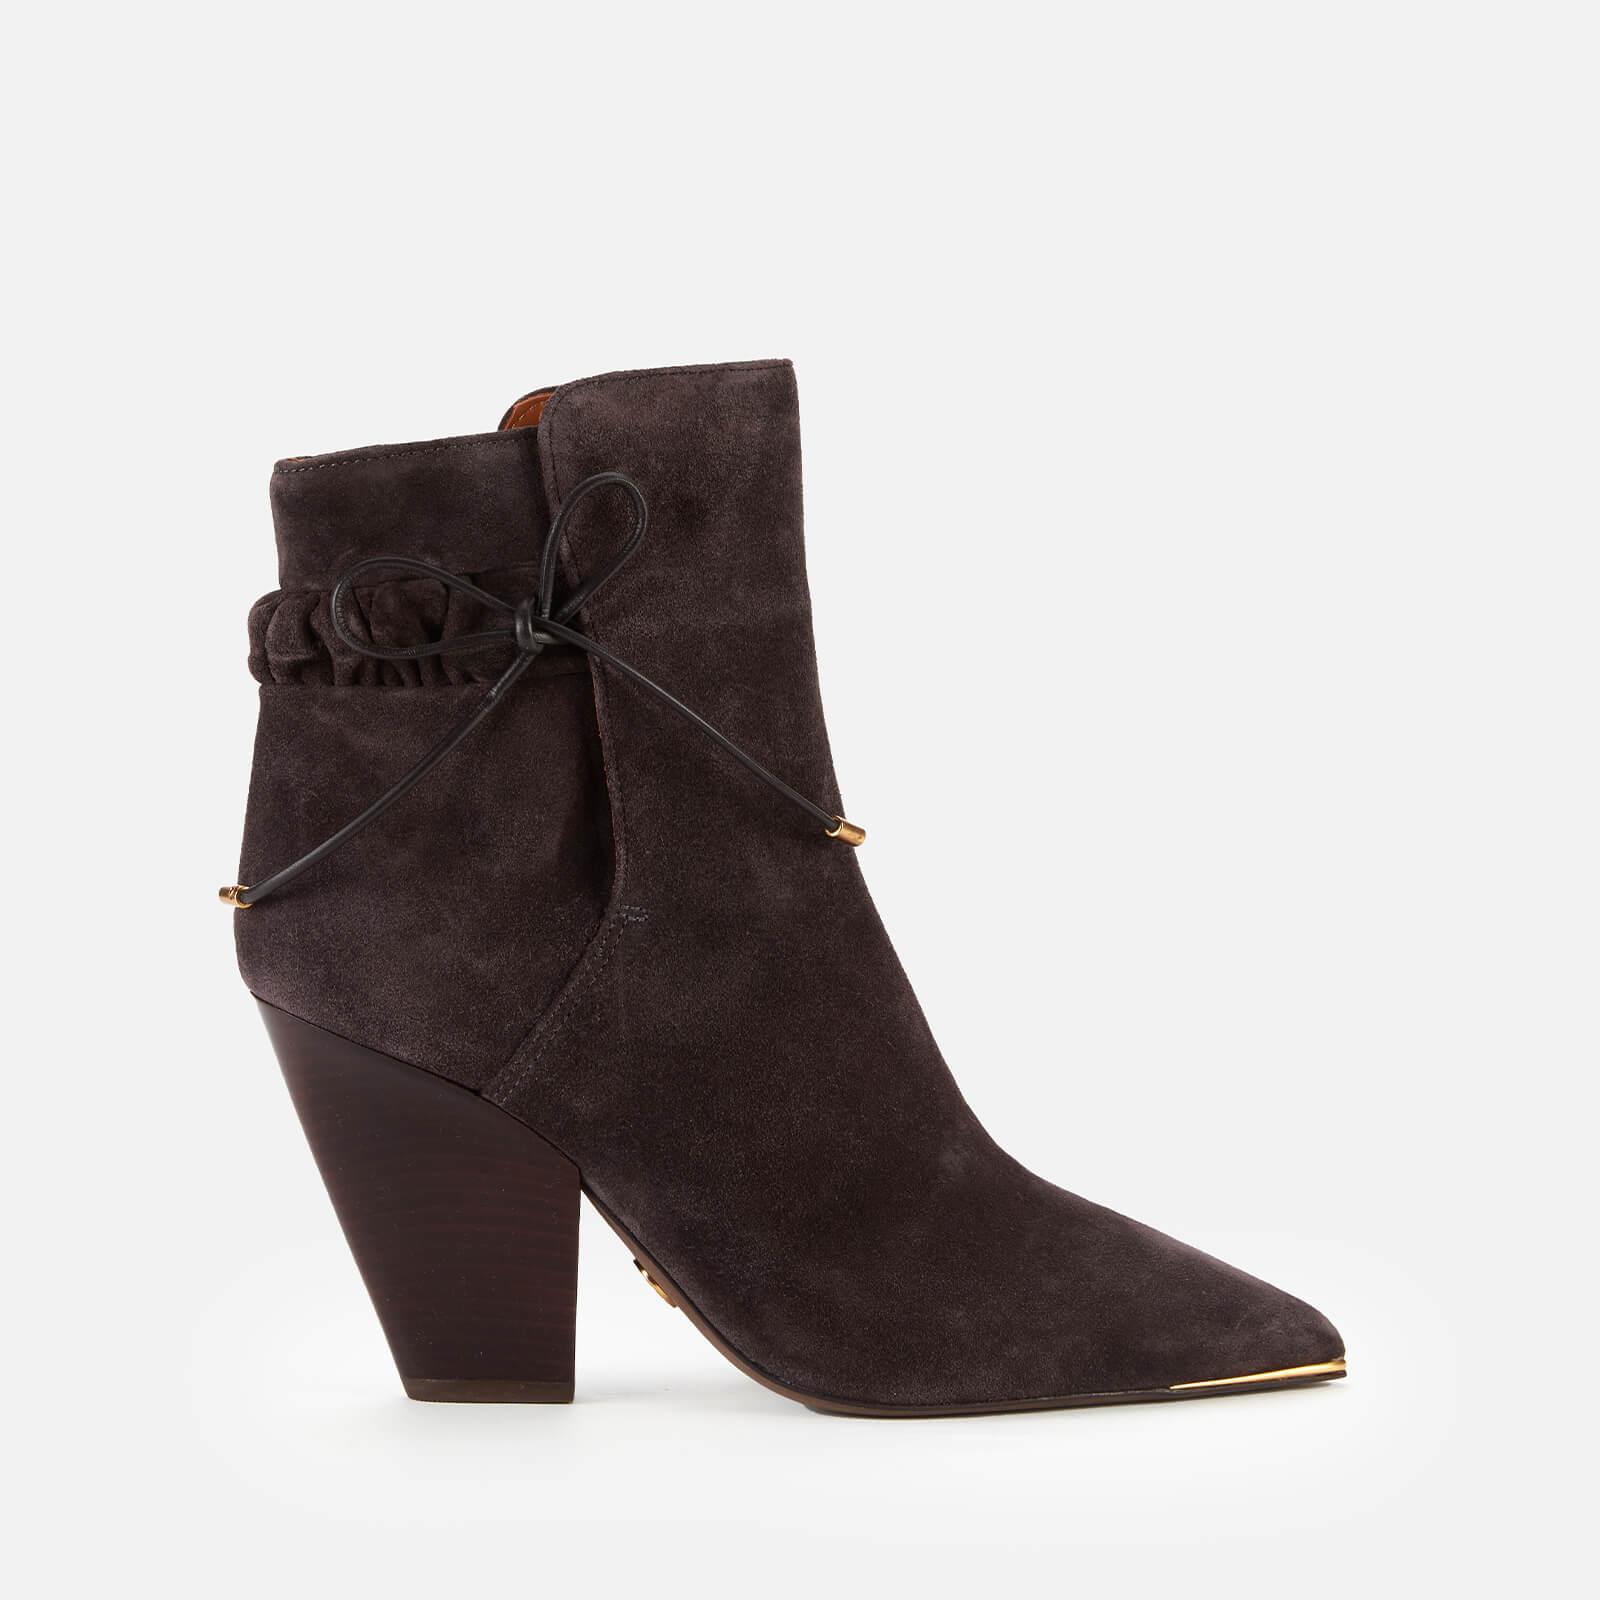 Tory Burch Women's Lila Suede Heeled Boots - Grey - 3